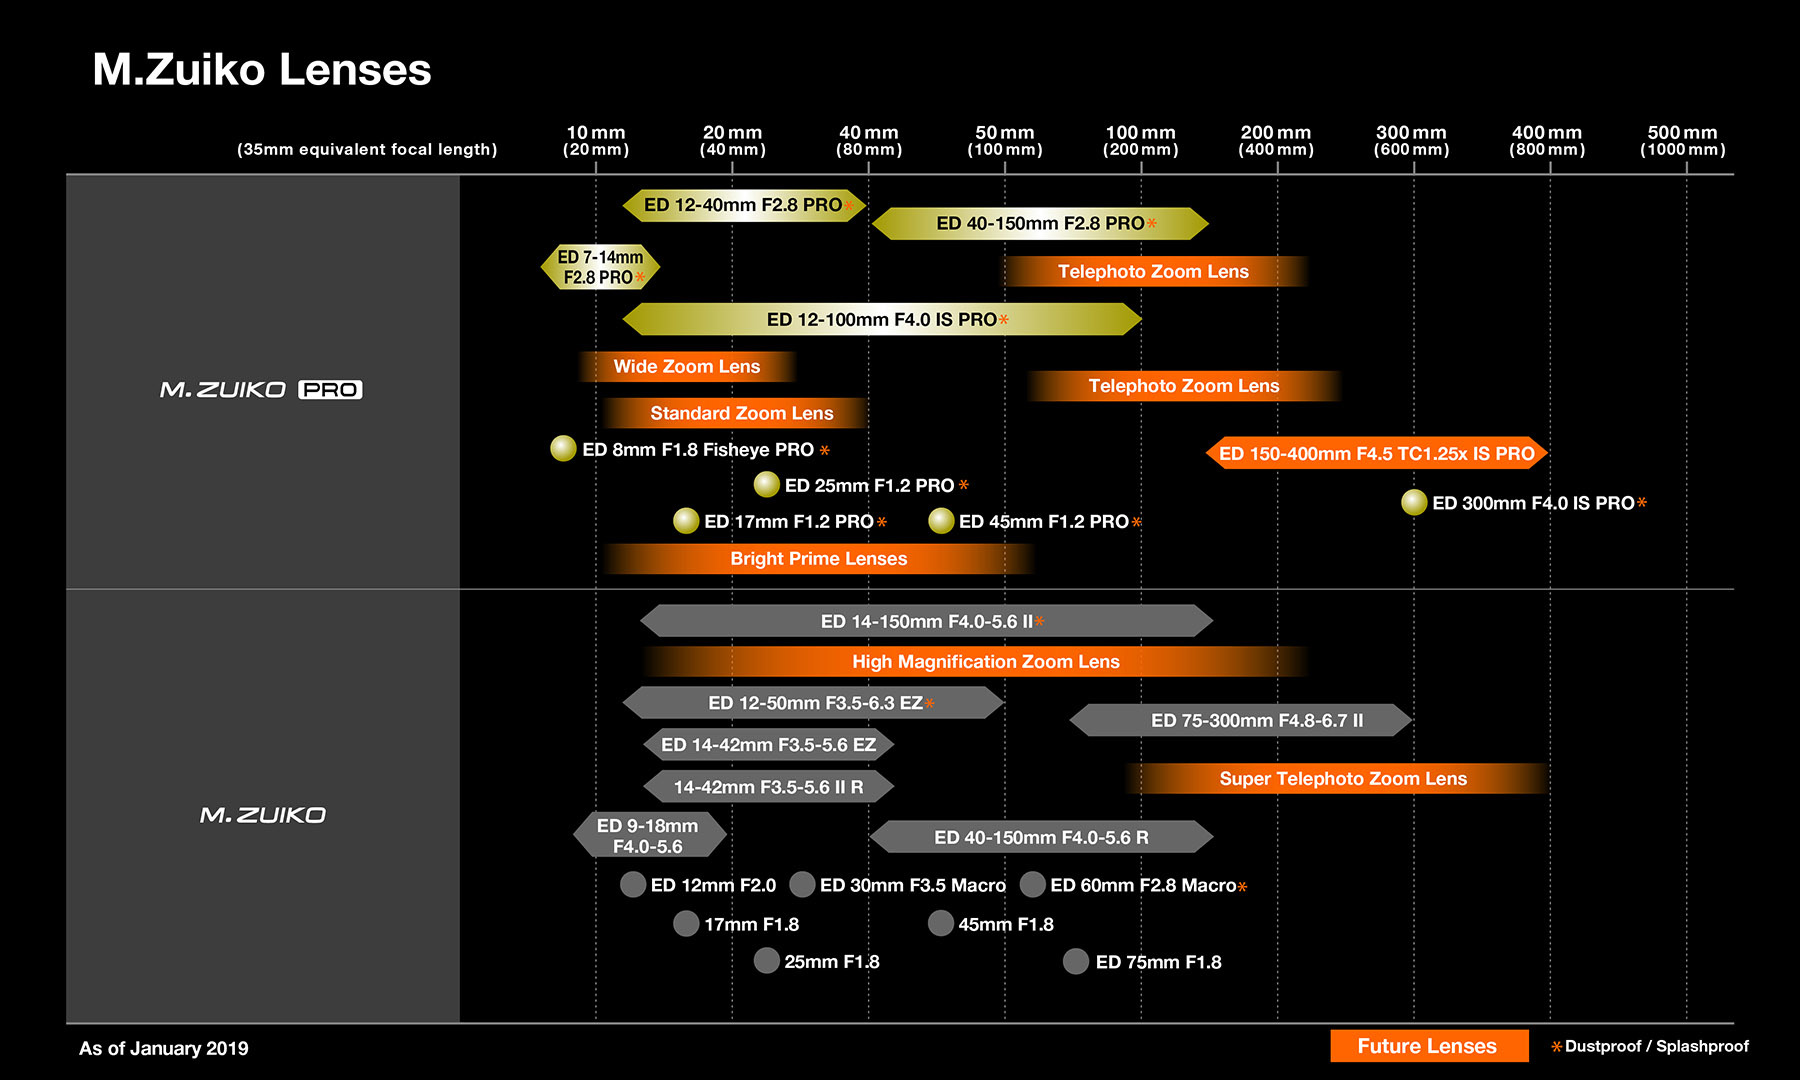 M.Zuiko_lens roadmap.jpg